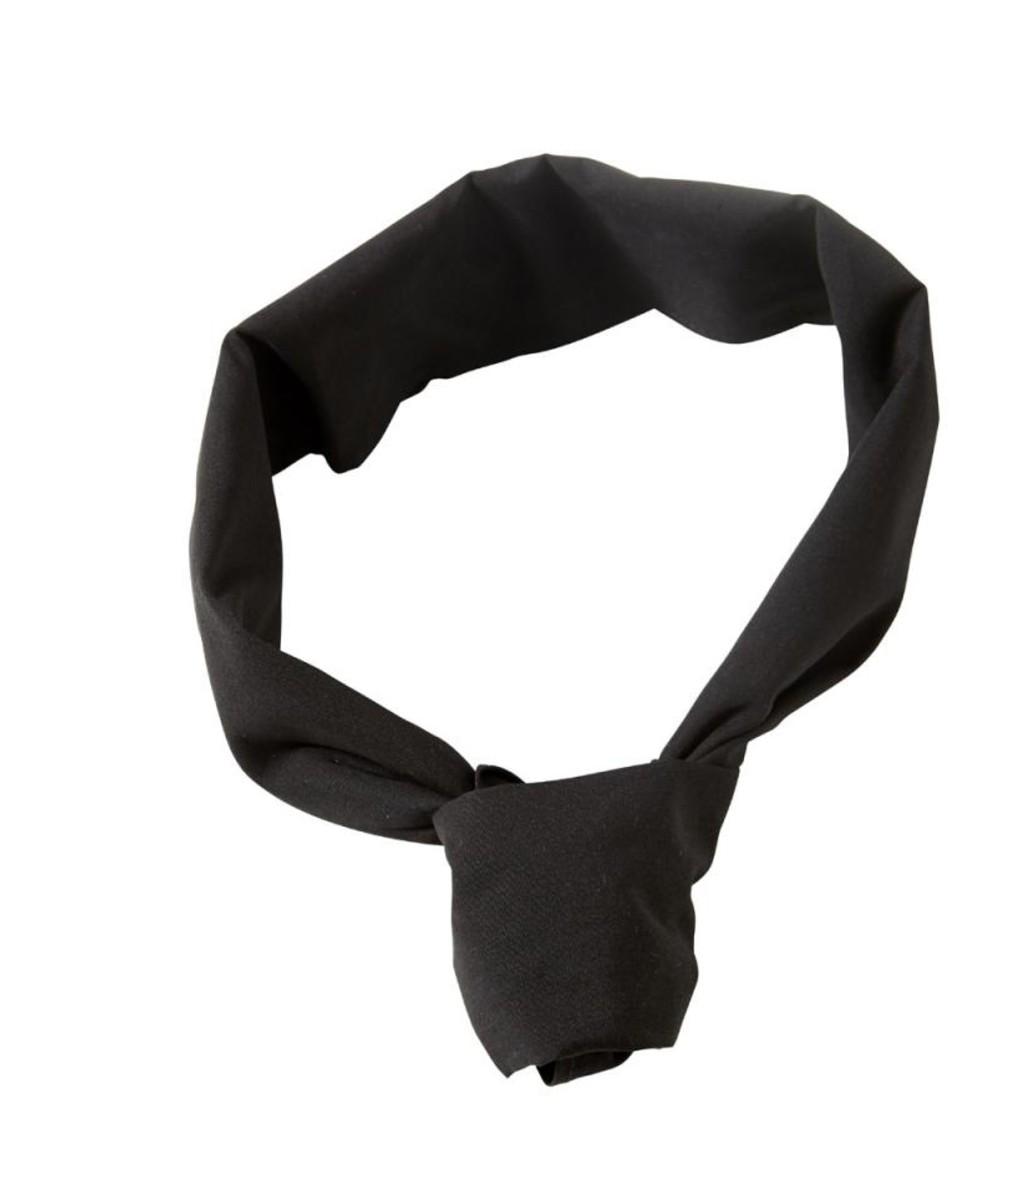 Neckerchief Accessories 3